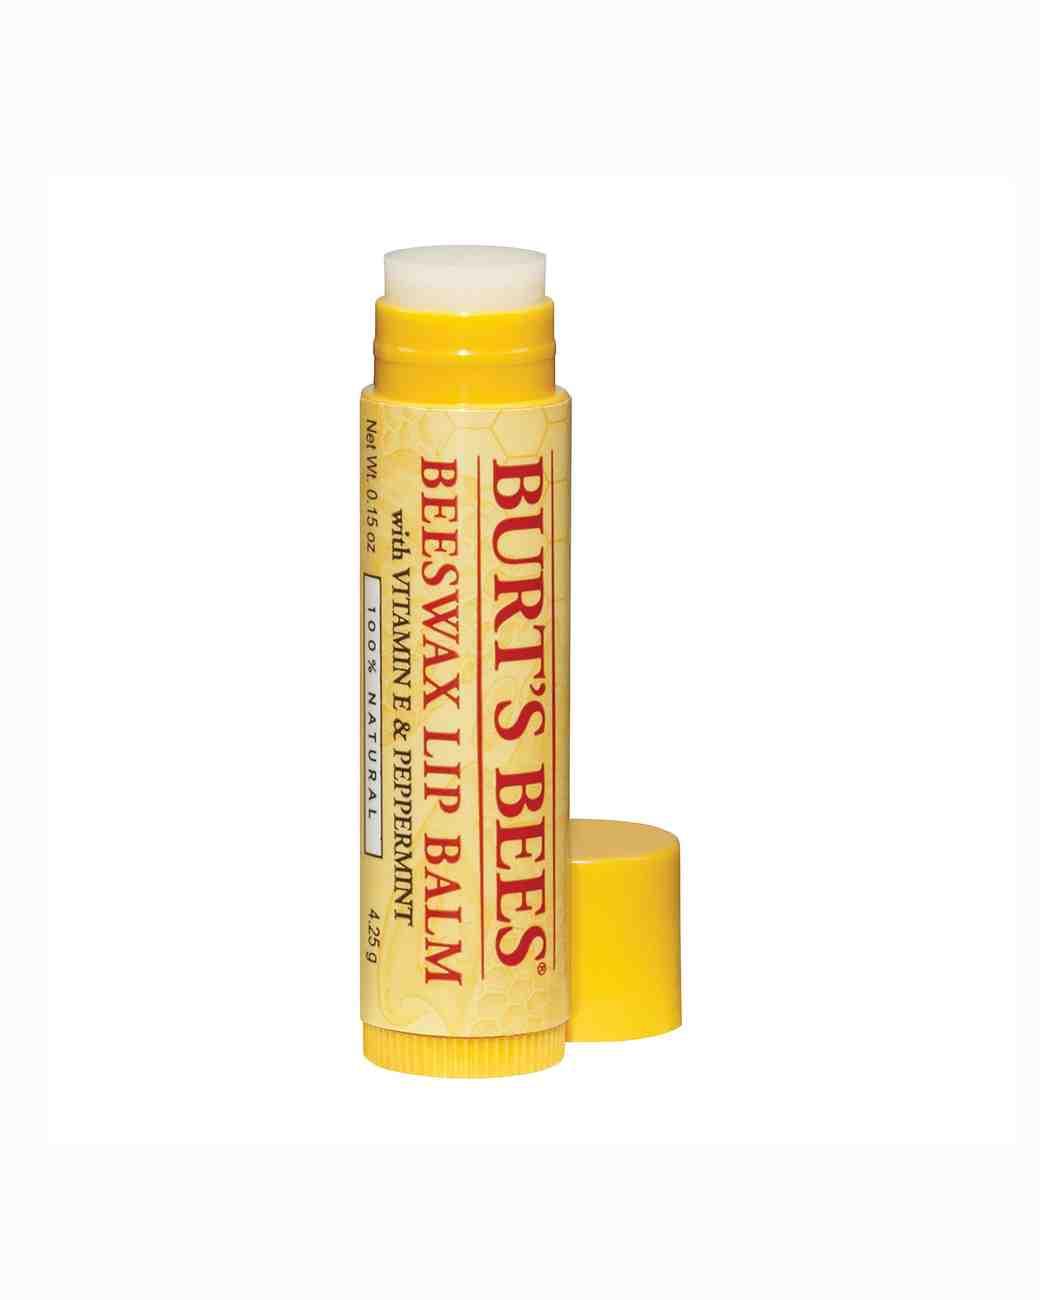 big-day-beauty-awards-burts-bees-beeswax-lip-balm-0216.jpg